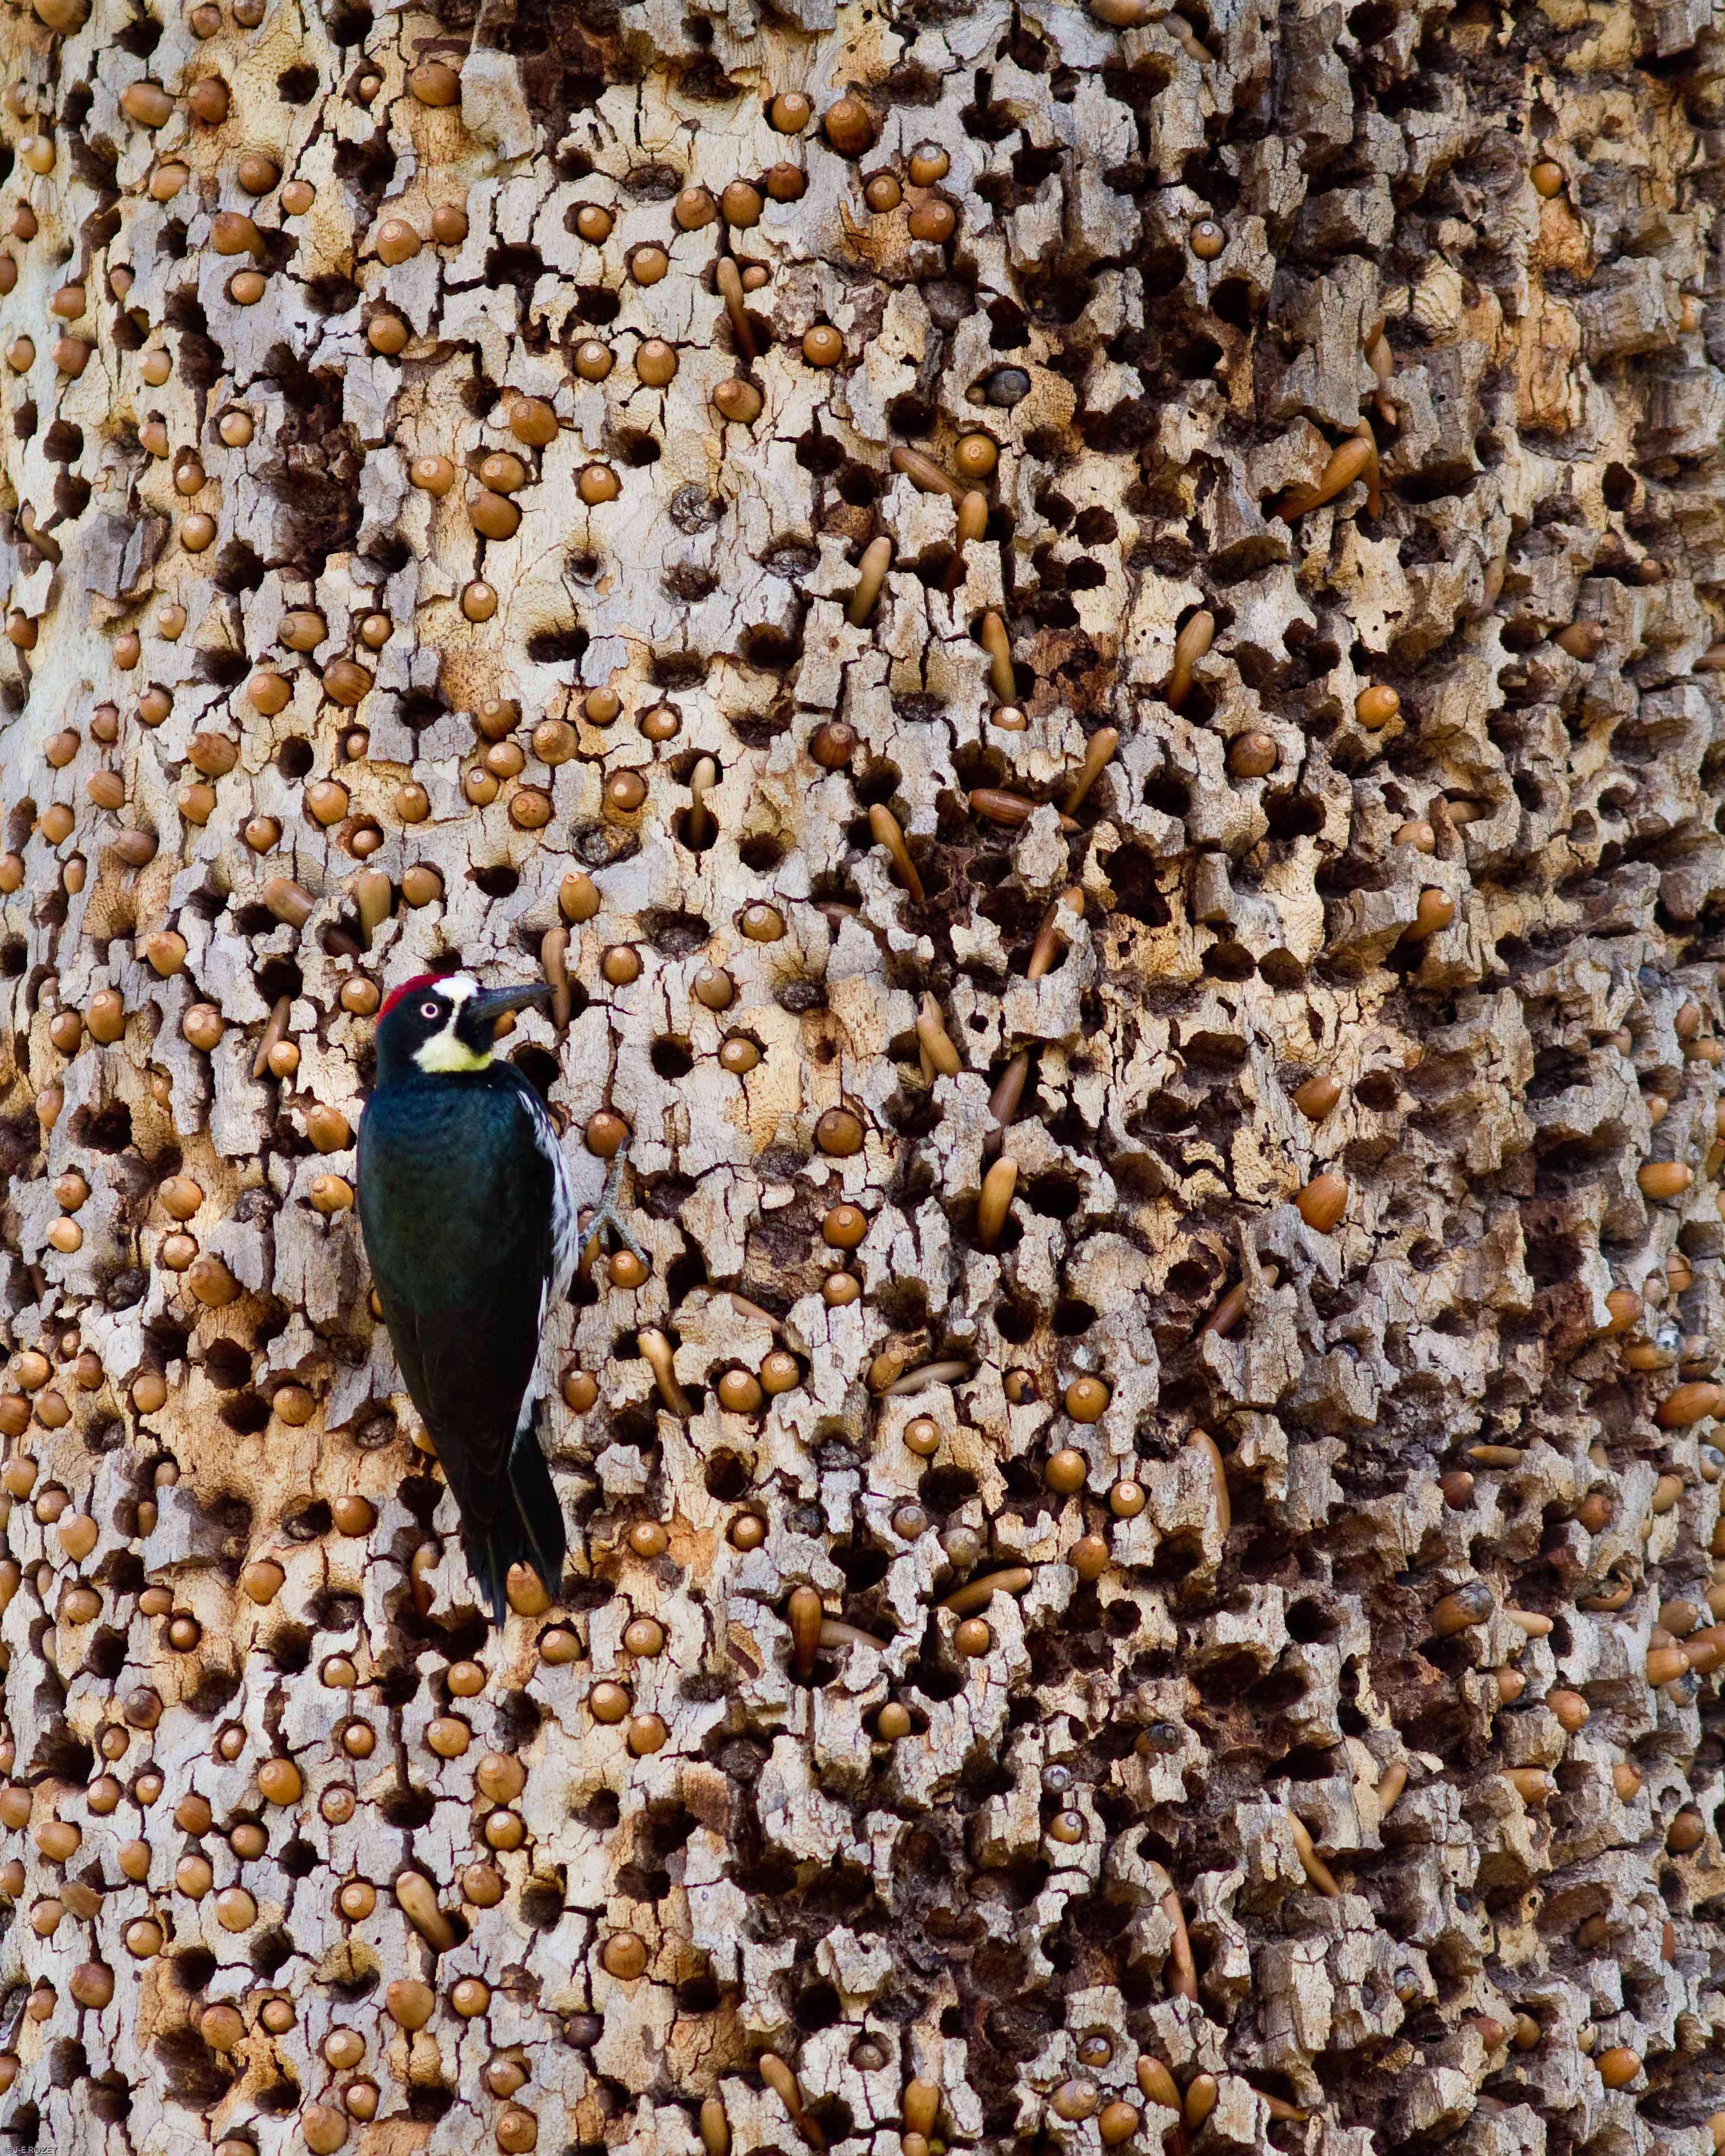 acorn woodpecker on a granary tree